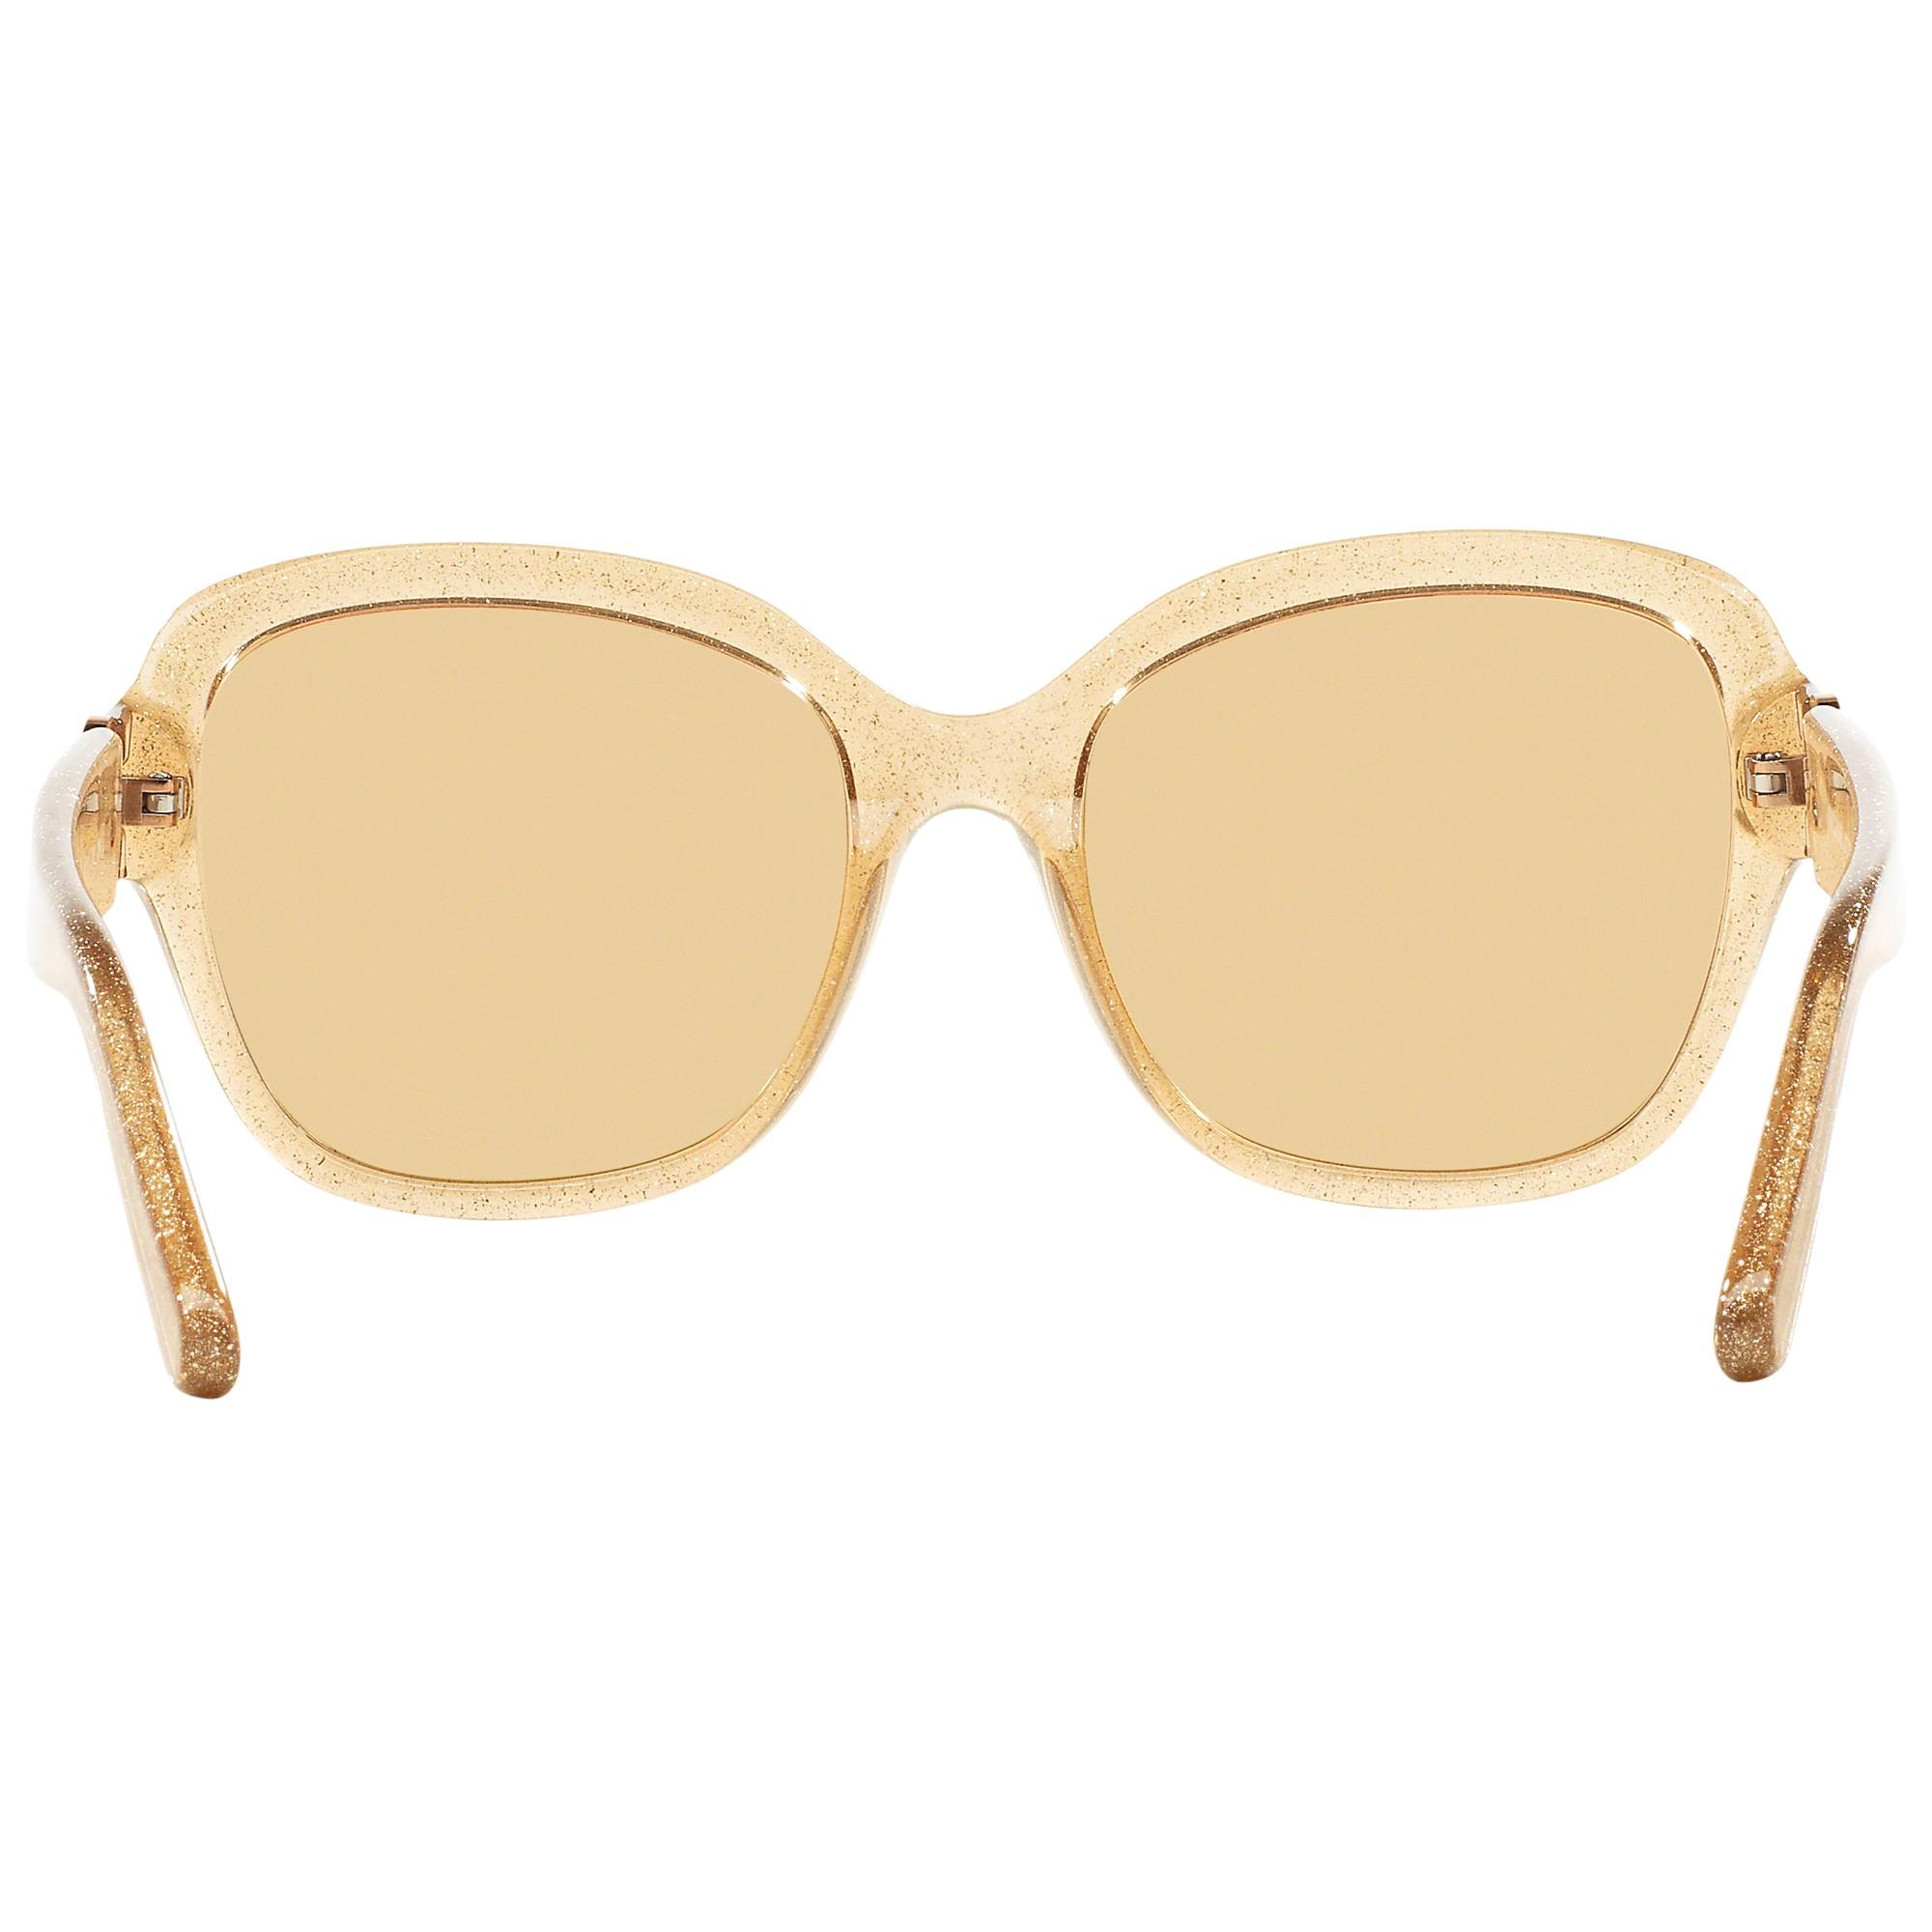 3a281ca93f Michael Kors Mk6027 Tabitha Iii Polarised Square Sunglasses in Metallic -  Lyst